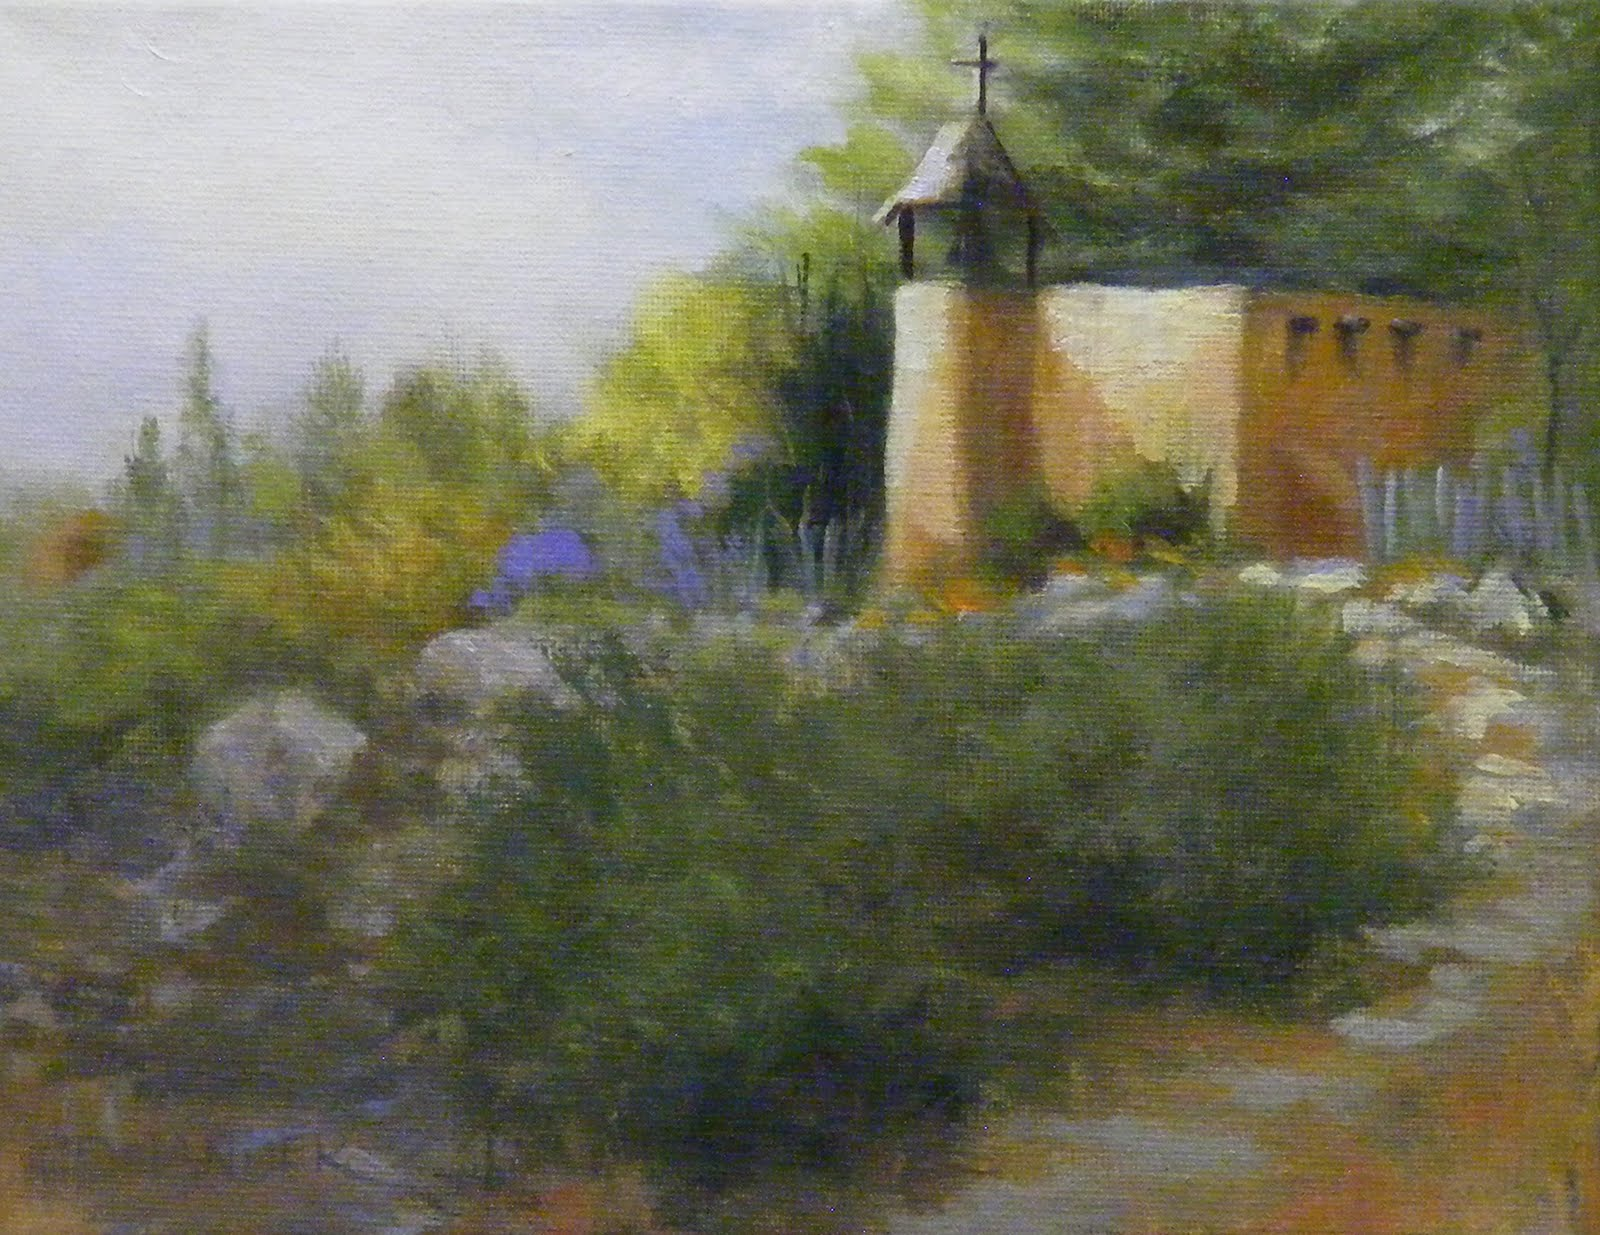 """Adobe Church on the Hill, Landscape"" original fine art by Diana Delander"